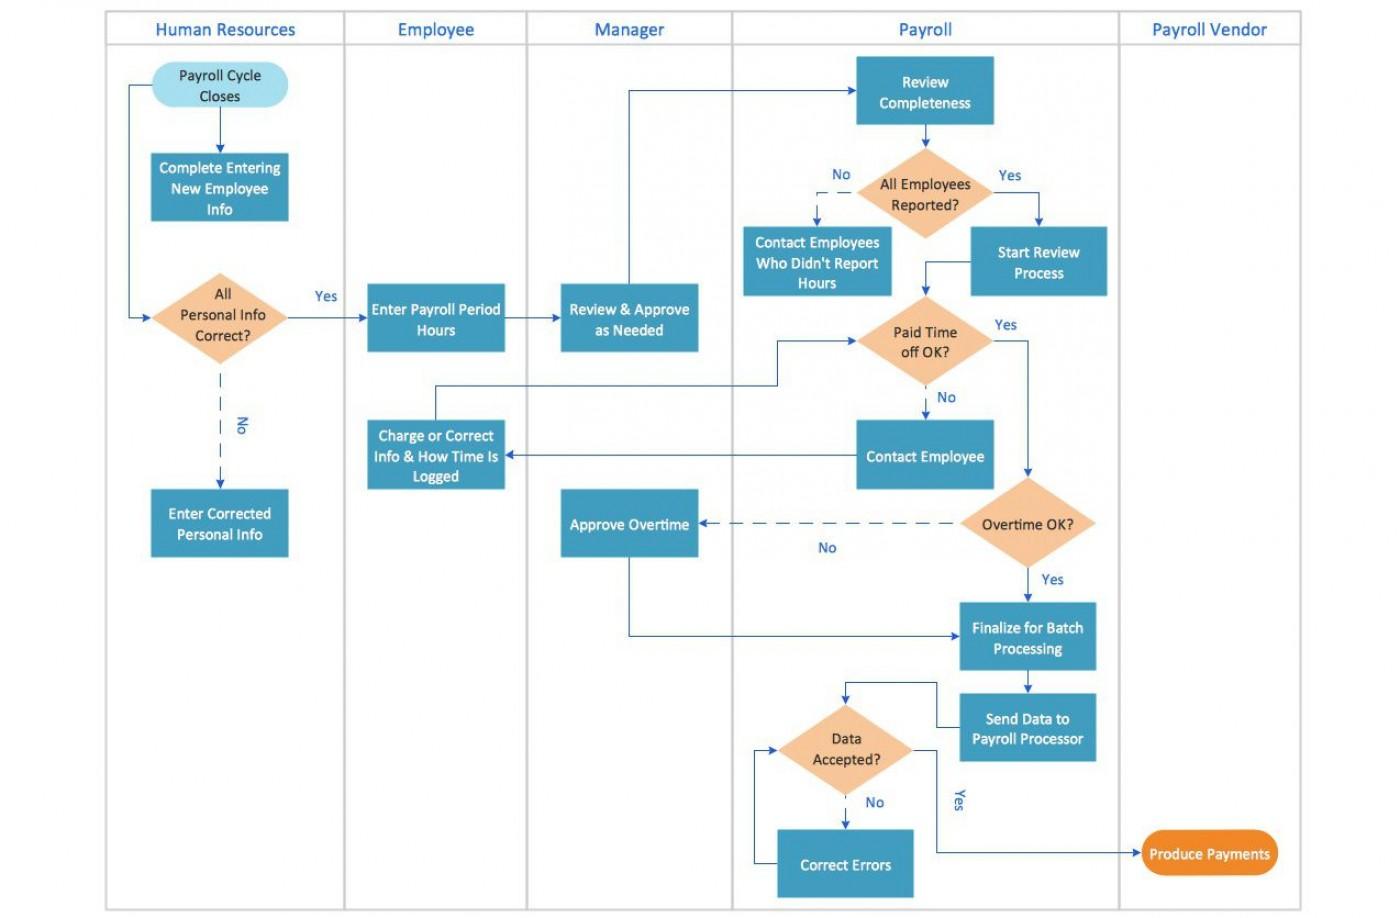 000 Singular Proces Flow Chart Template Xl Image  Free Manufacturing1400